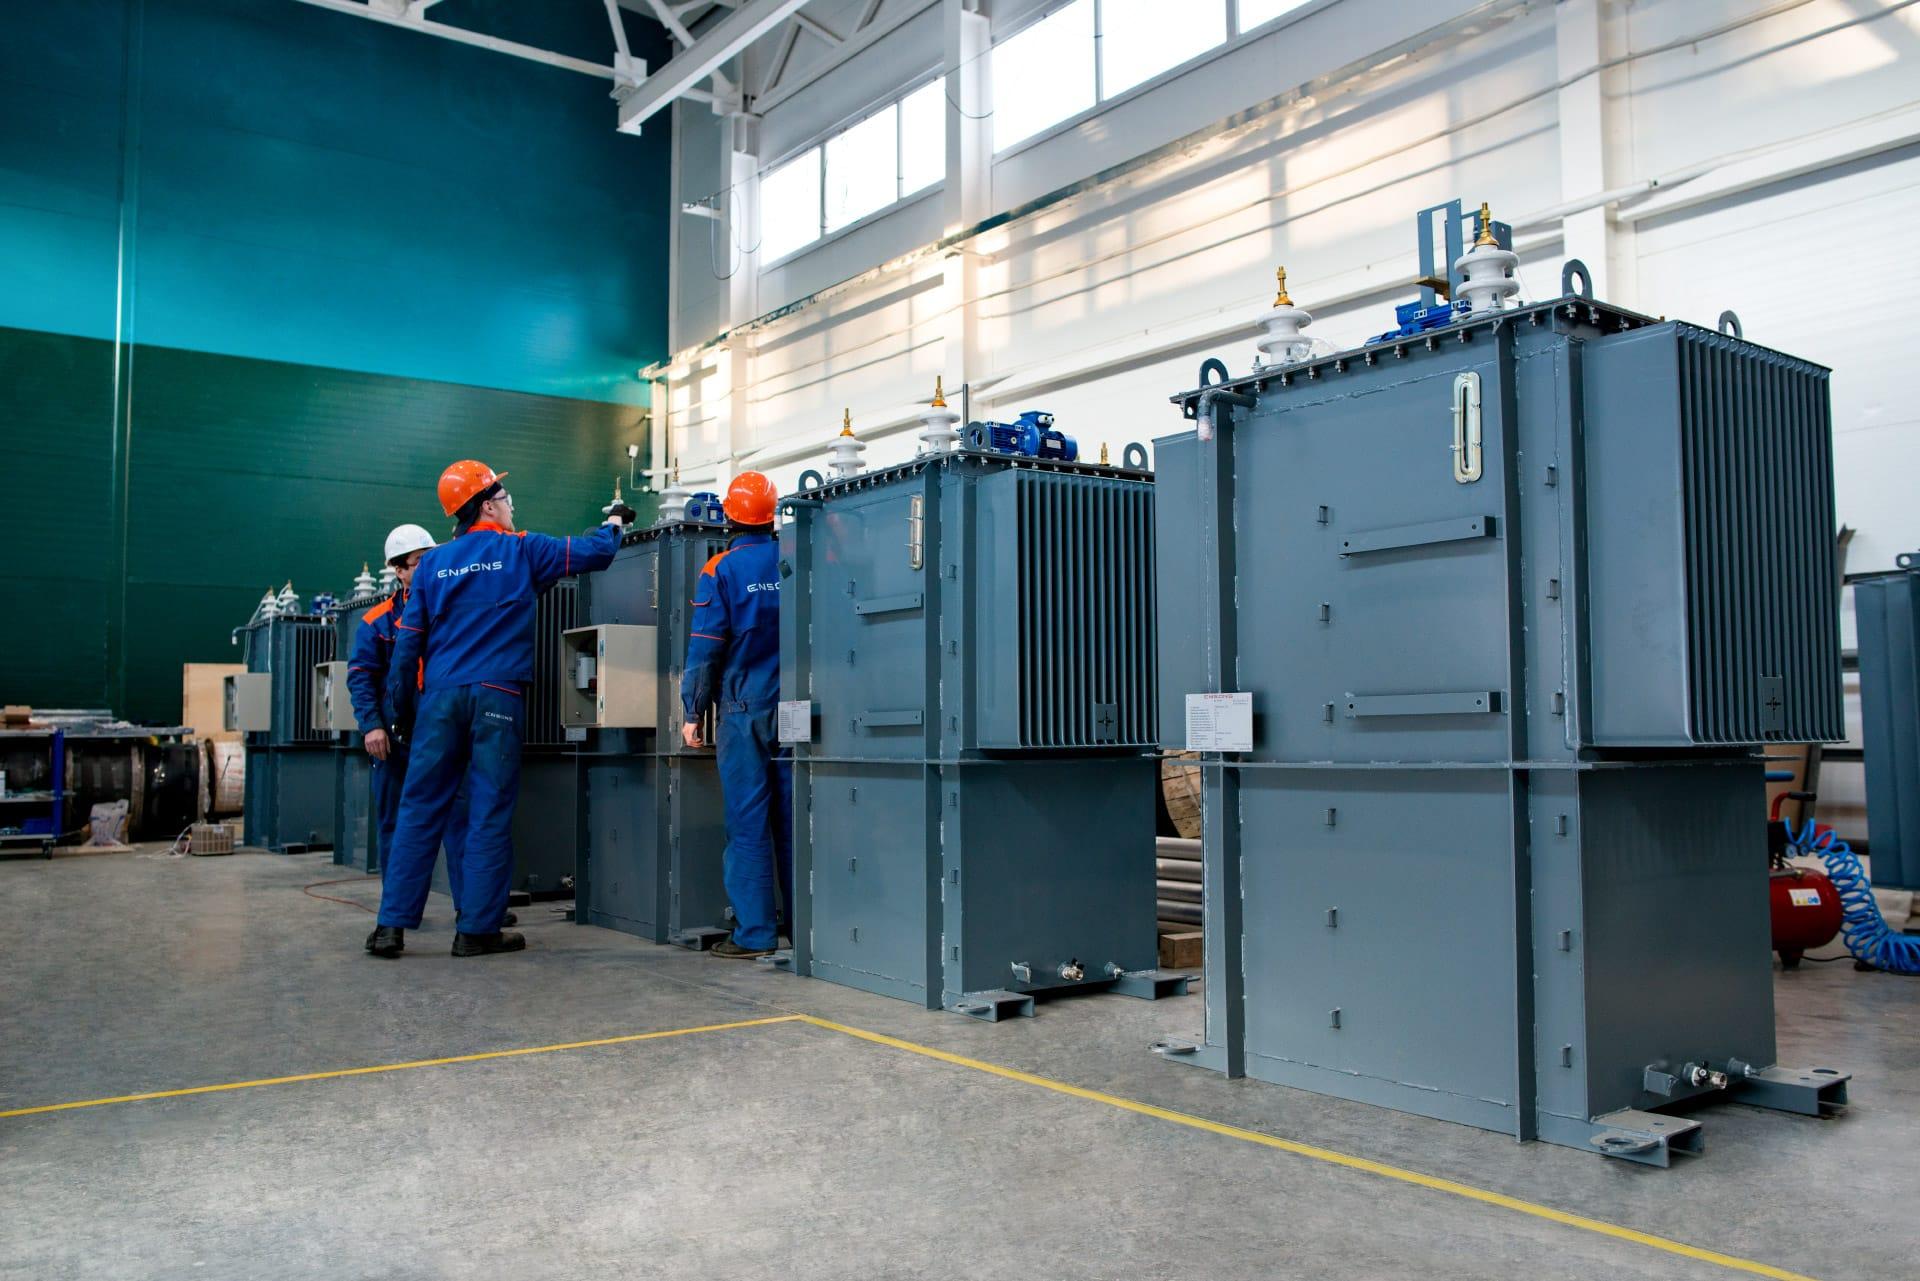 Ensons - Баки реакторов РЗДПОМ в цеху